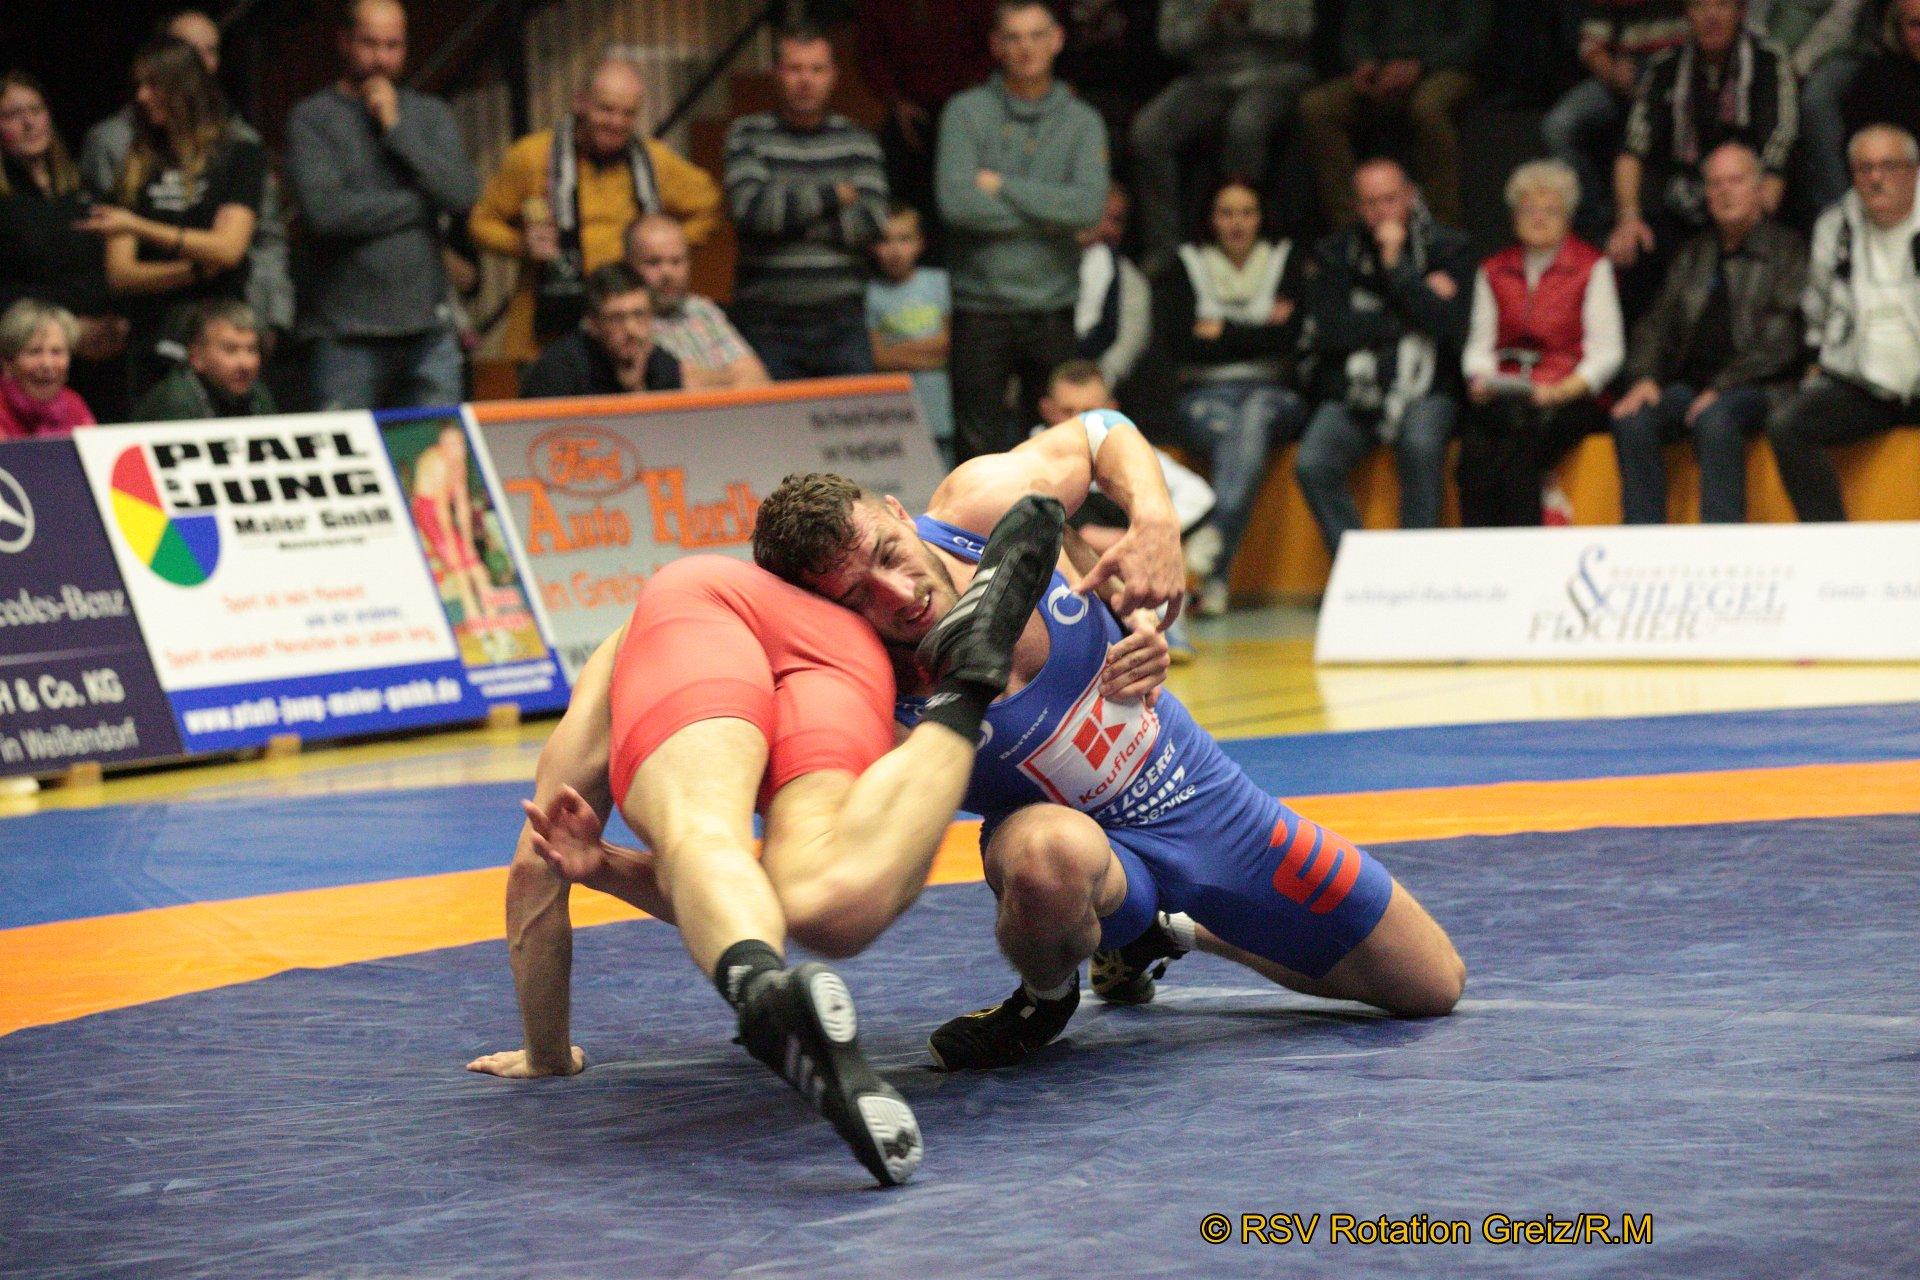 75Bkg Freistil: Daniel Sartakov (1) (rotes Trikot), RSV Rotation Greiz gegen Haydar Yavuz EU (7), Red Devils Heilbronn 0:4/TÜ/1:16/05:57